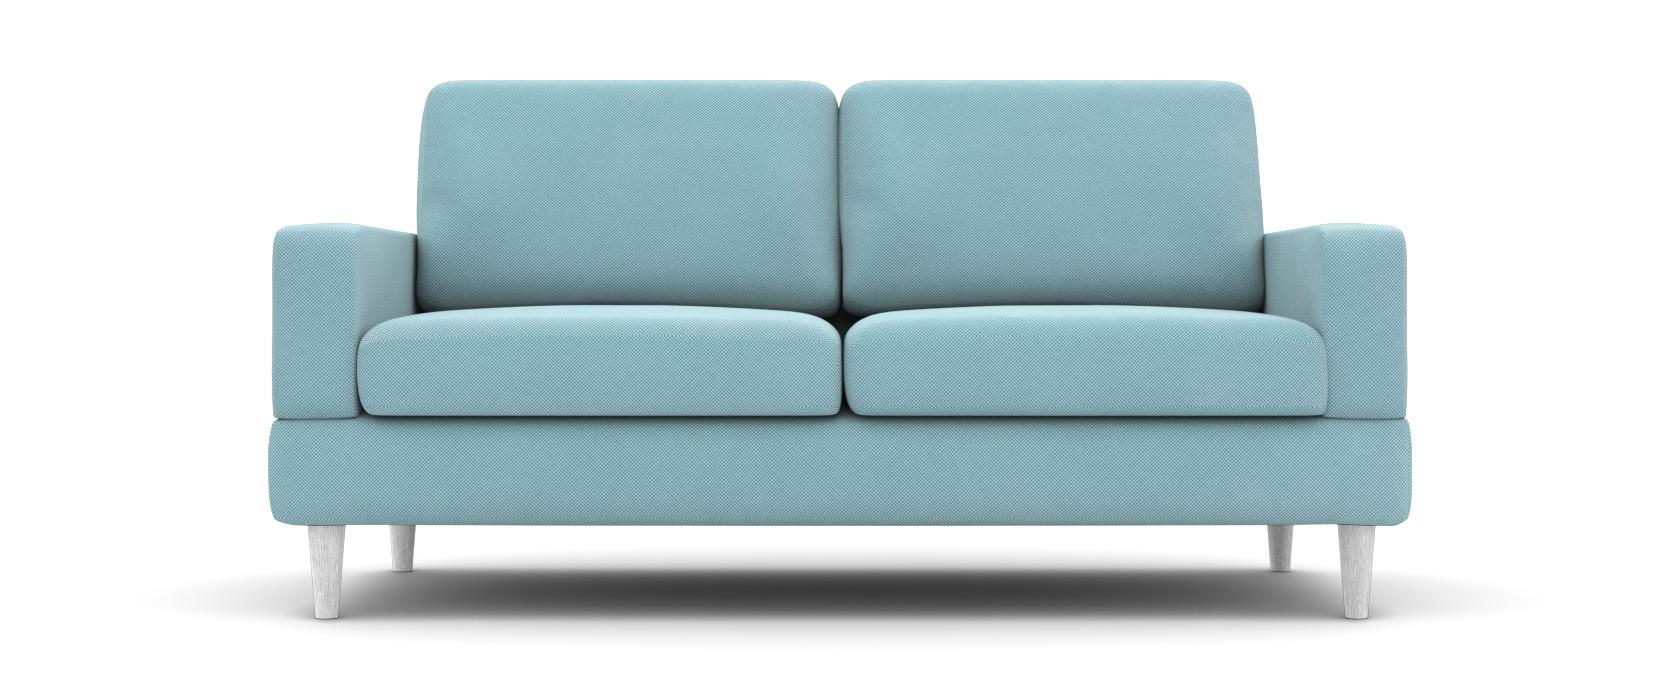 Двомісний диван Bruno - Pufetto